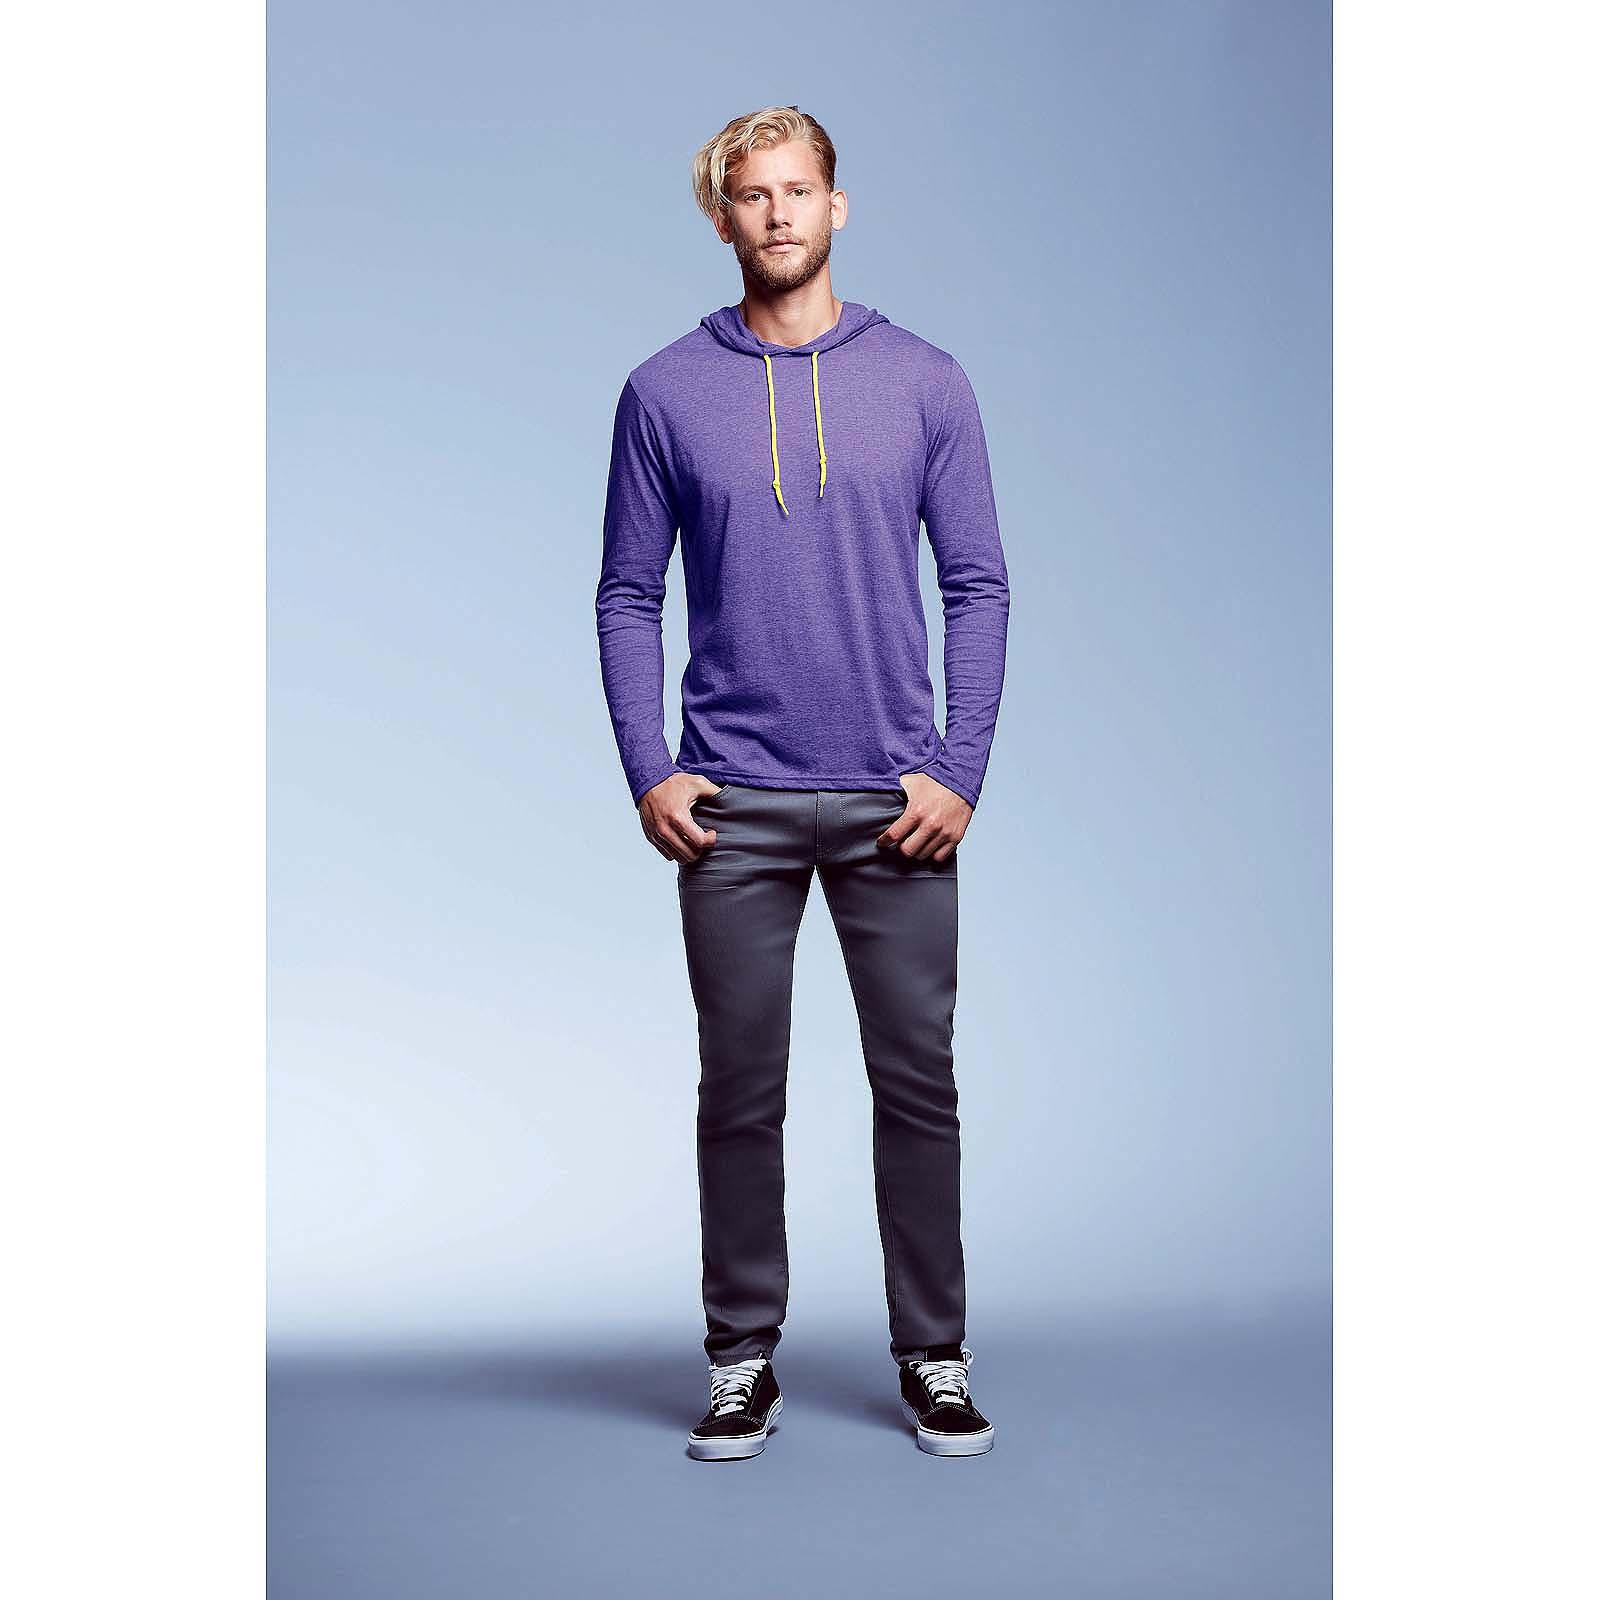 Mens-Adult-Fashion-Basic-Long-Sleeve-Hooded-T-Shirt-Hoodie-Tee-Top-Casual-Plain thumbnail 4